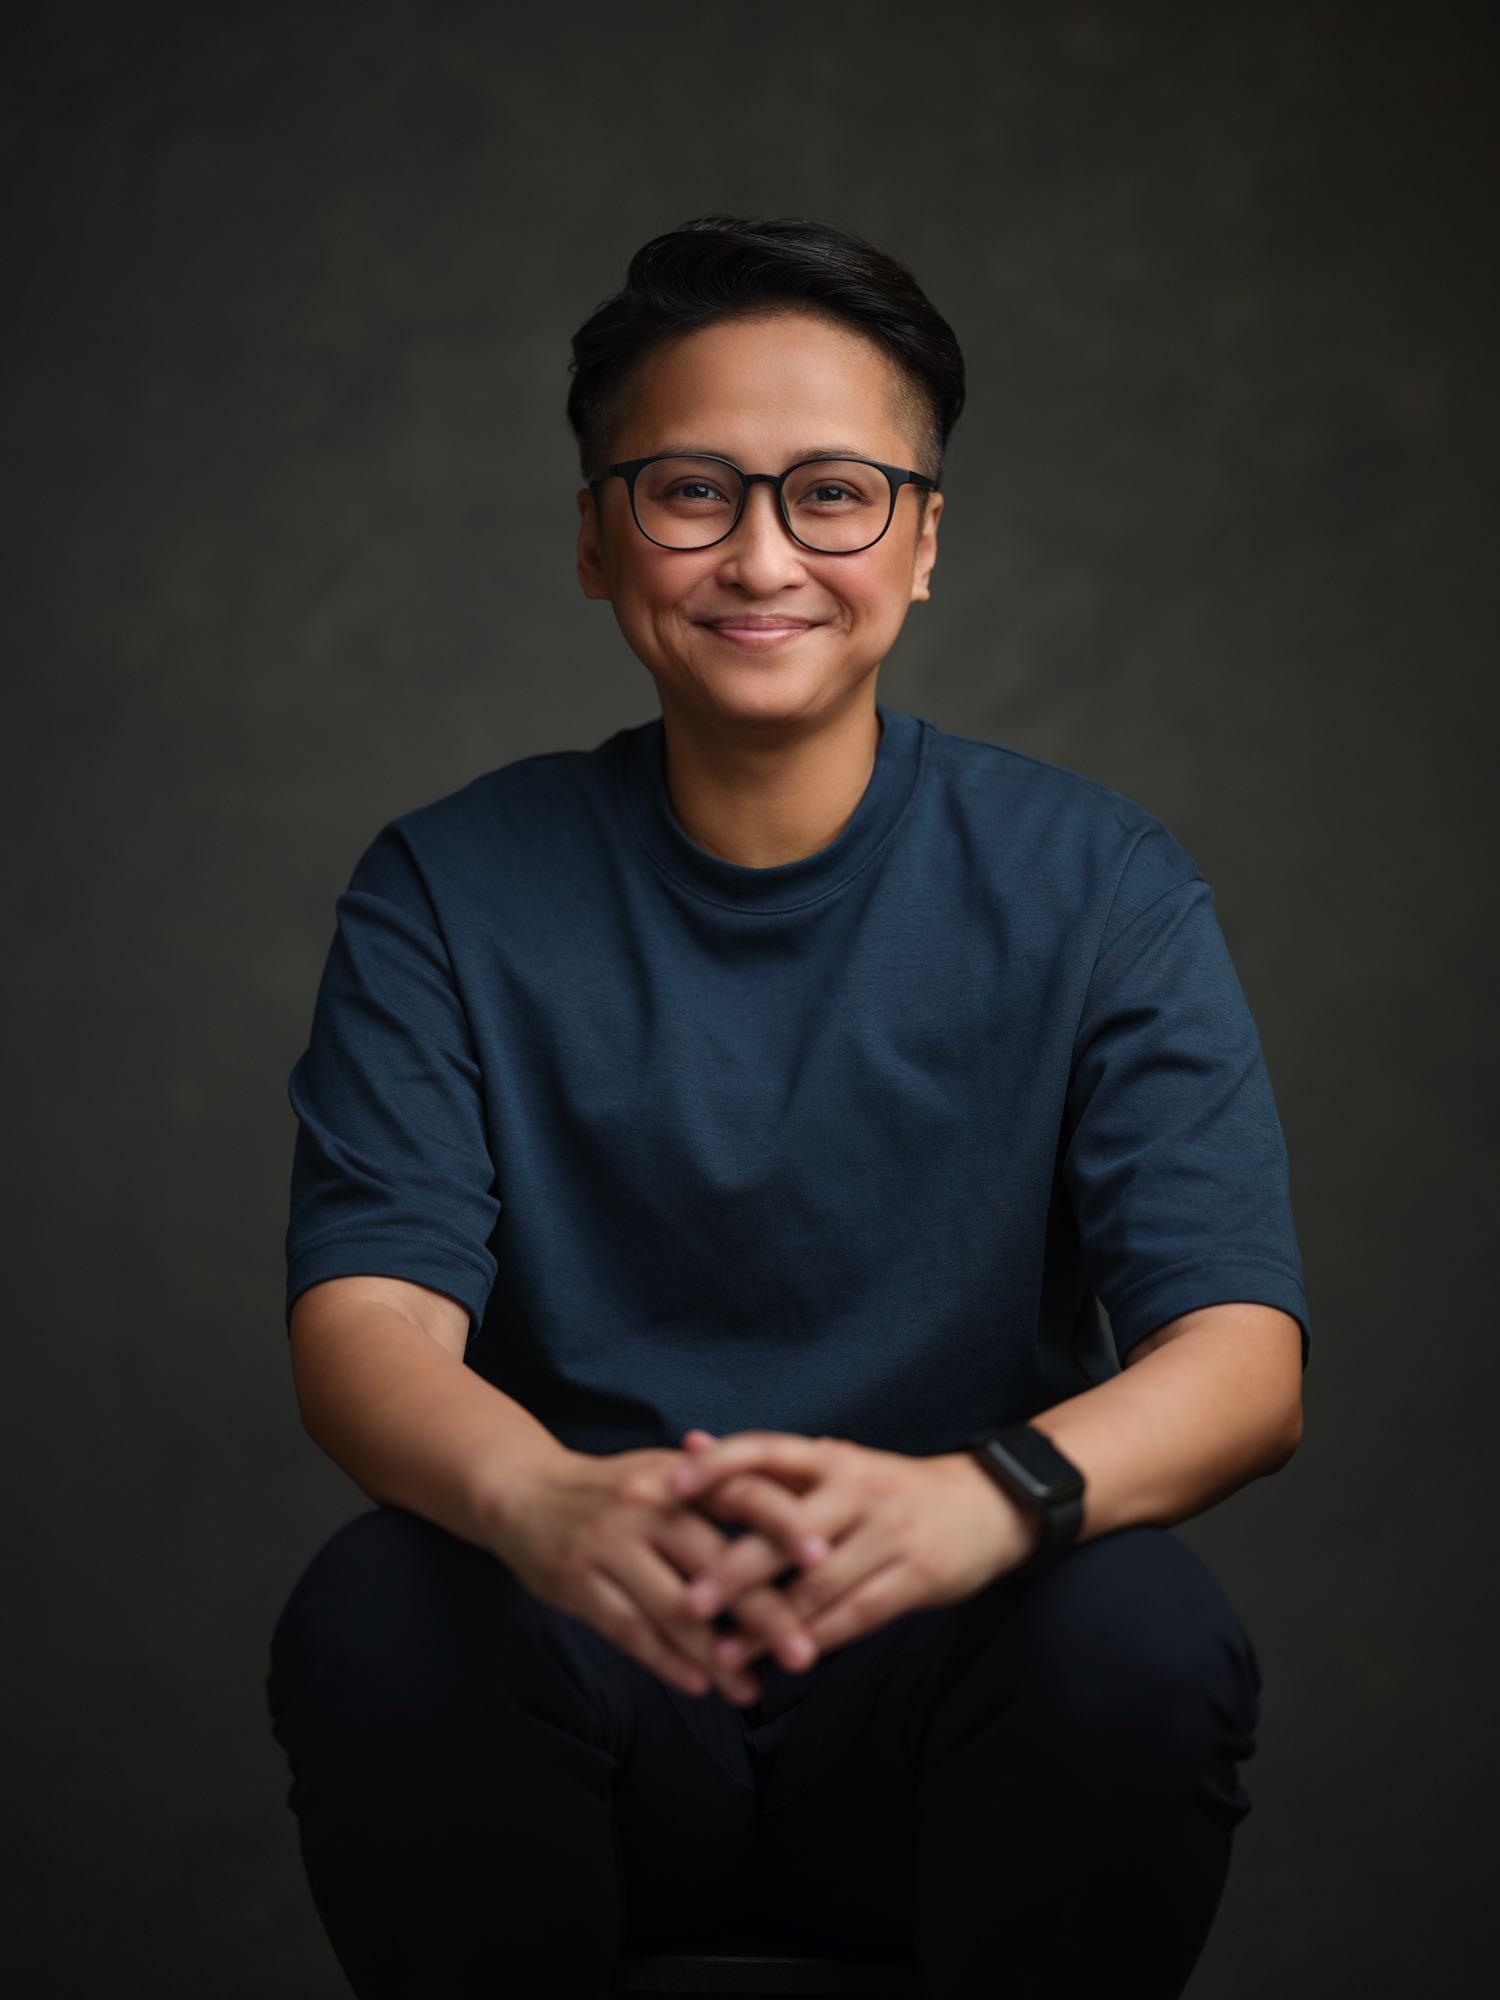 Headshot Session Portrait Photography Singapore COCO Creative Studio Photographer Quen-2